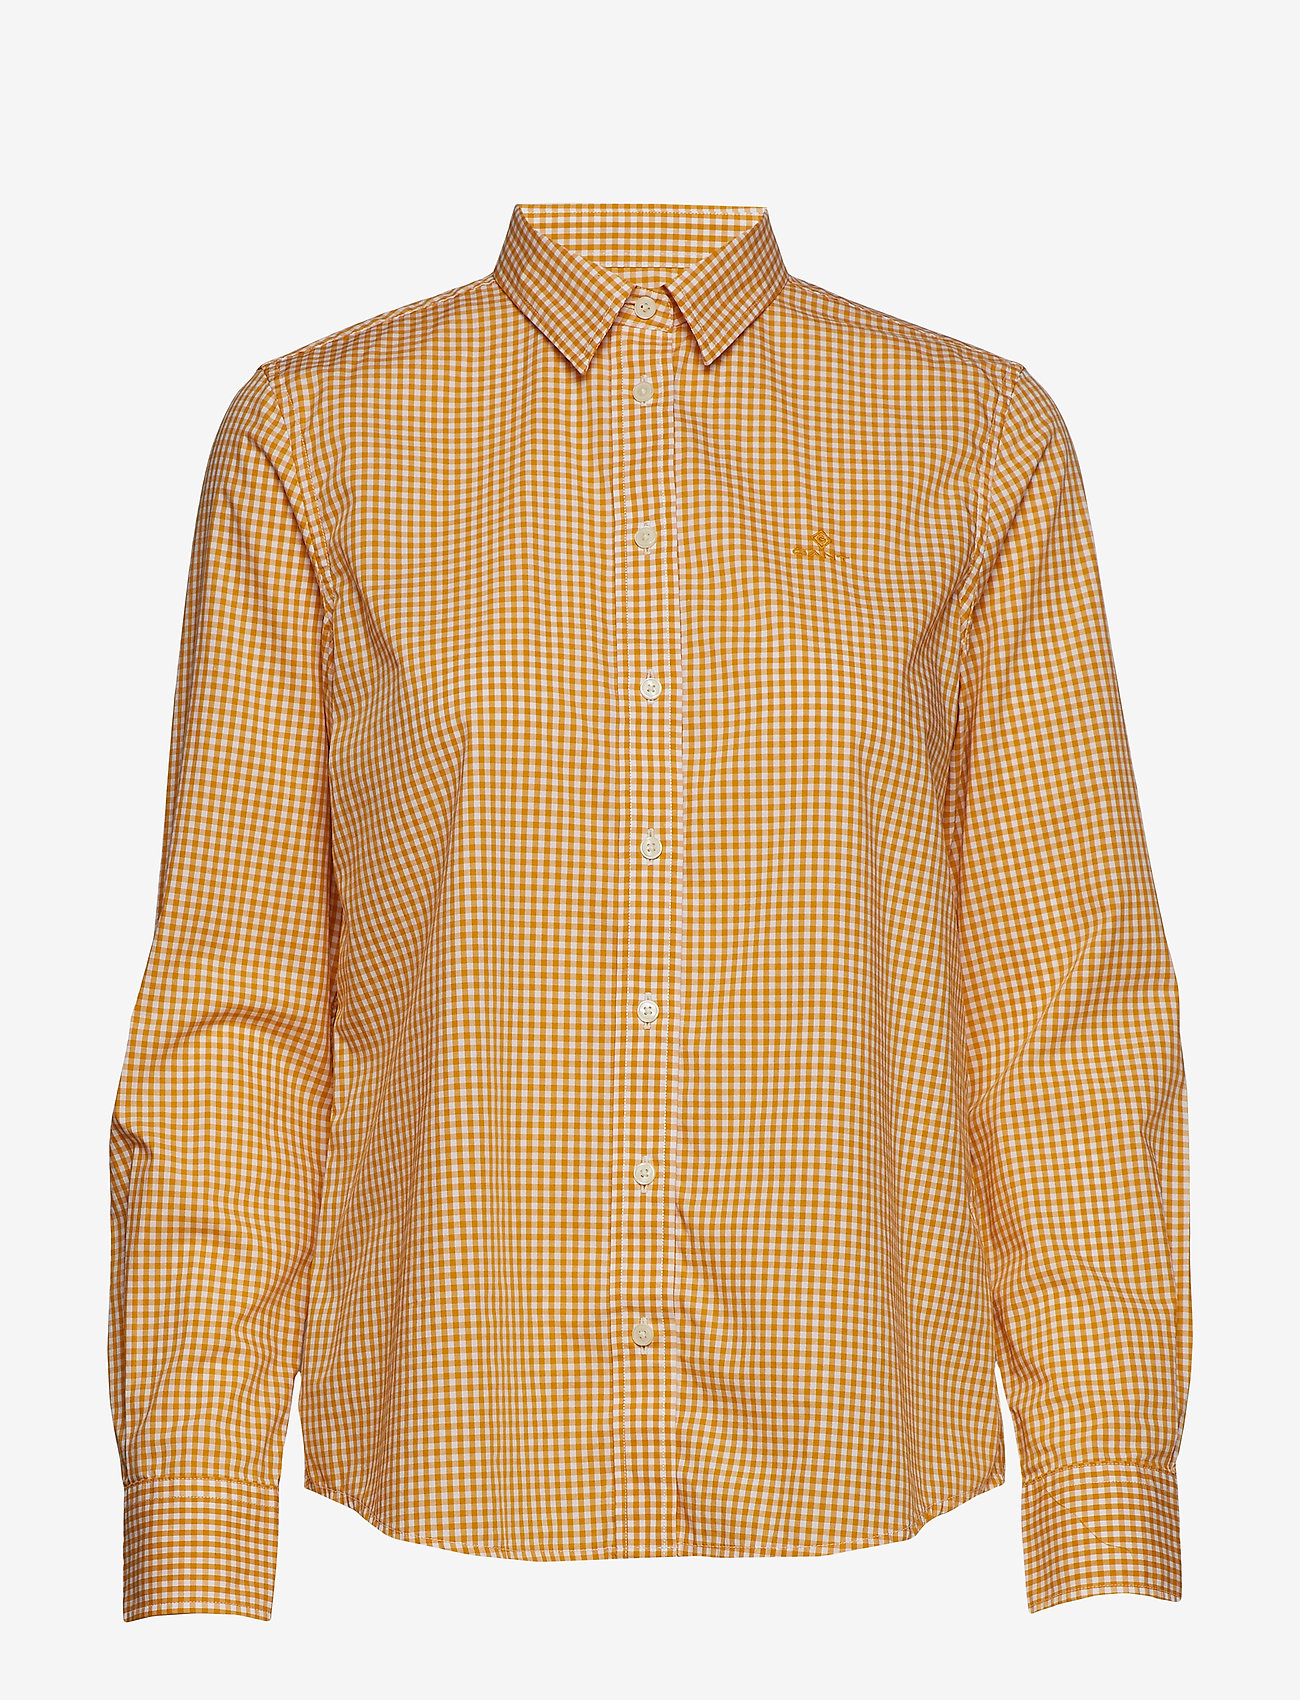 Gant - THE BROADCLOTH GINGHAM SHIRT - pitkähihaiset paidat - ivy gold